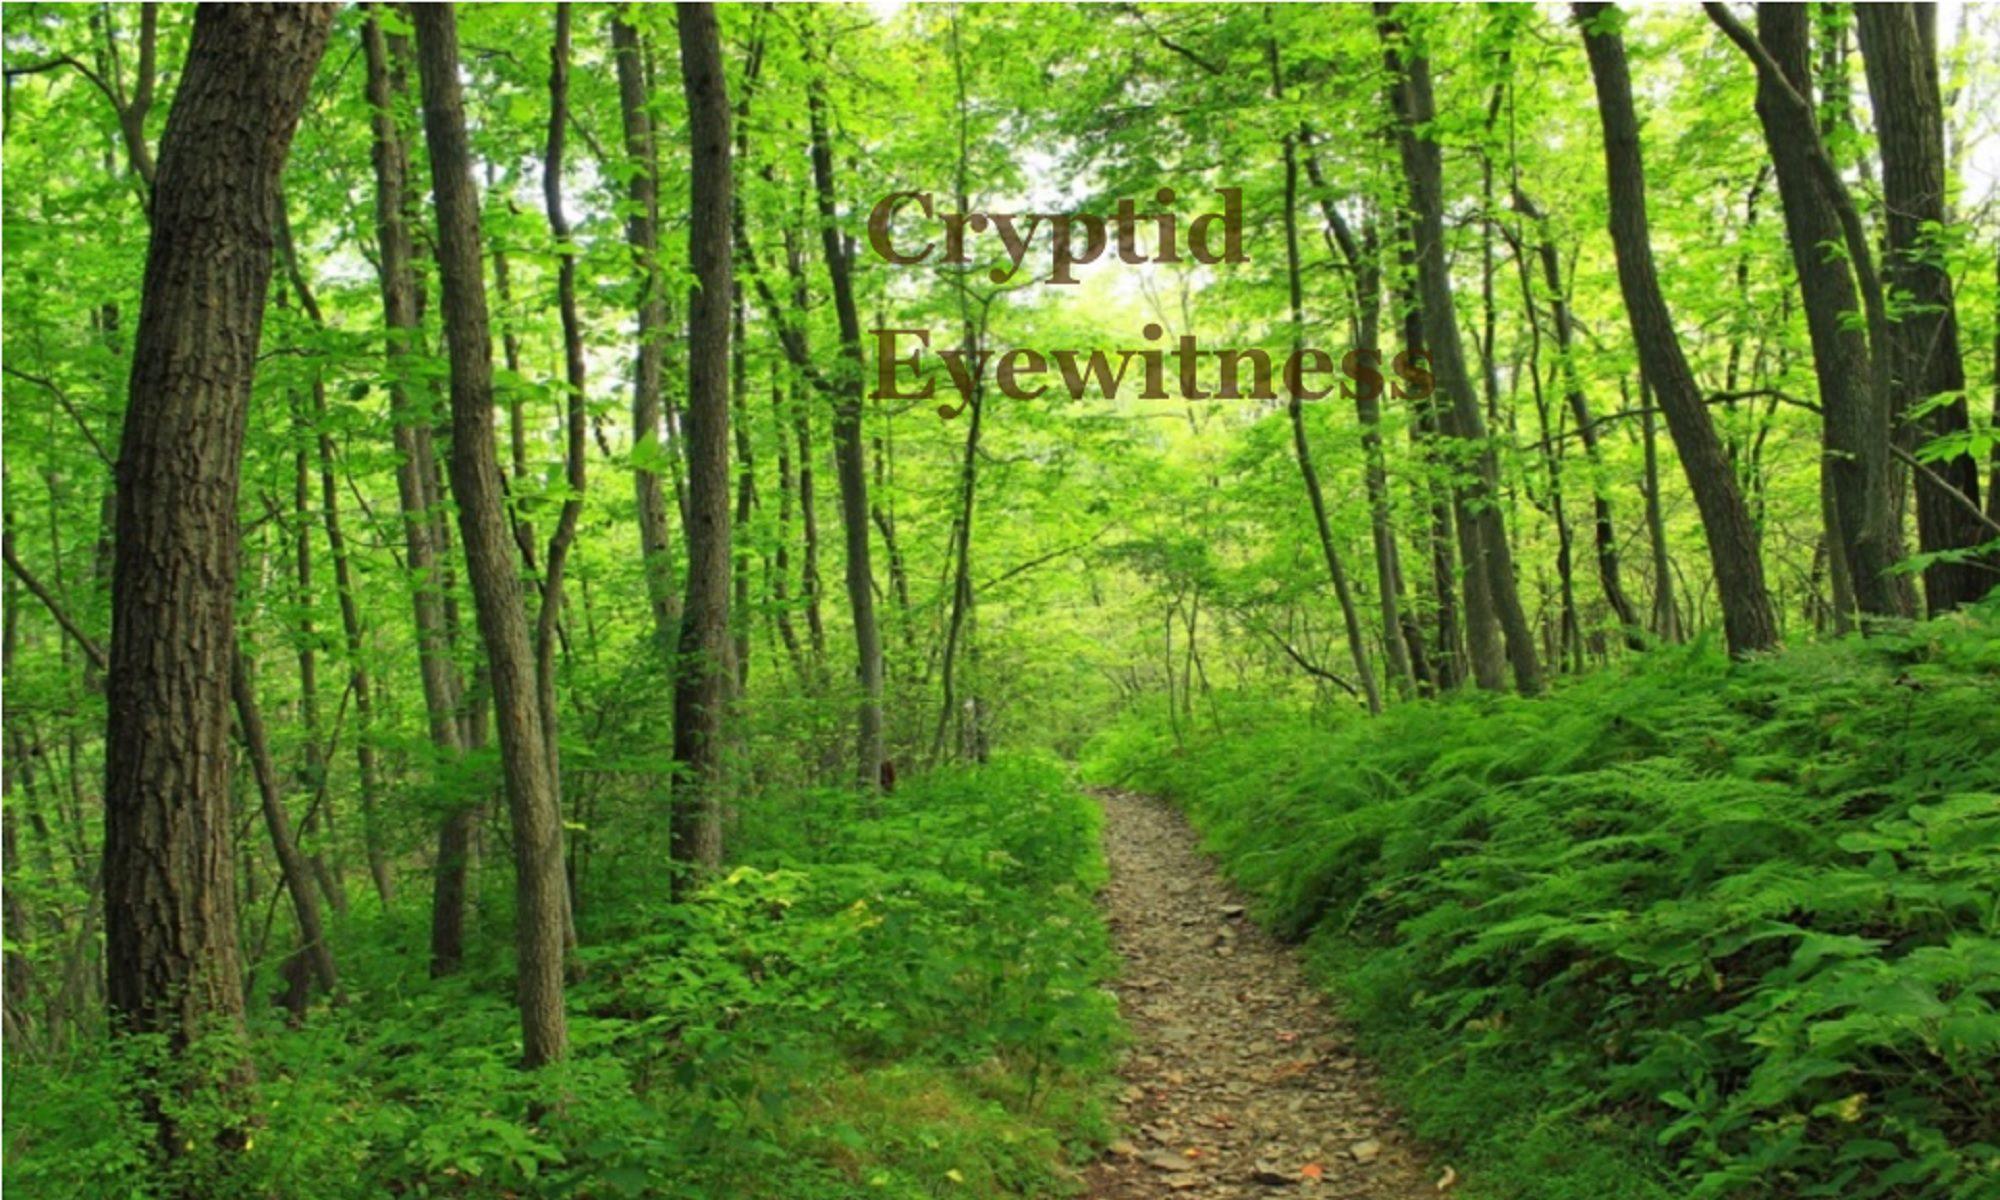 Cryptid Eyewitness